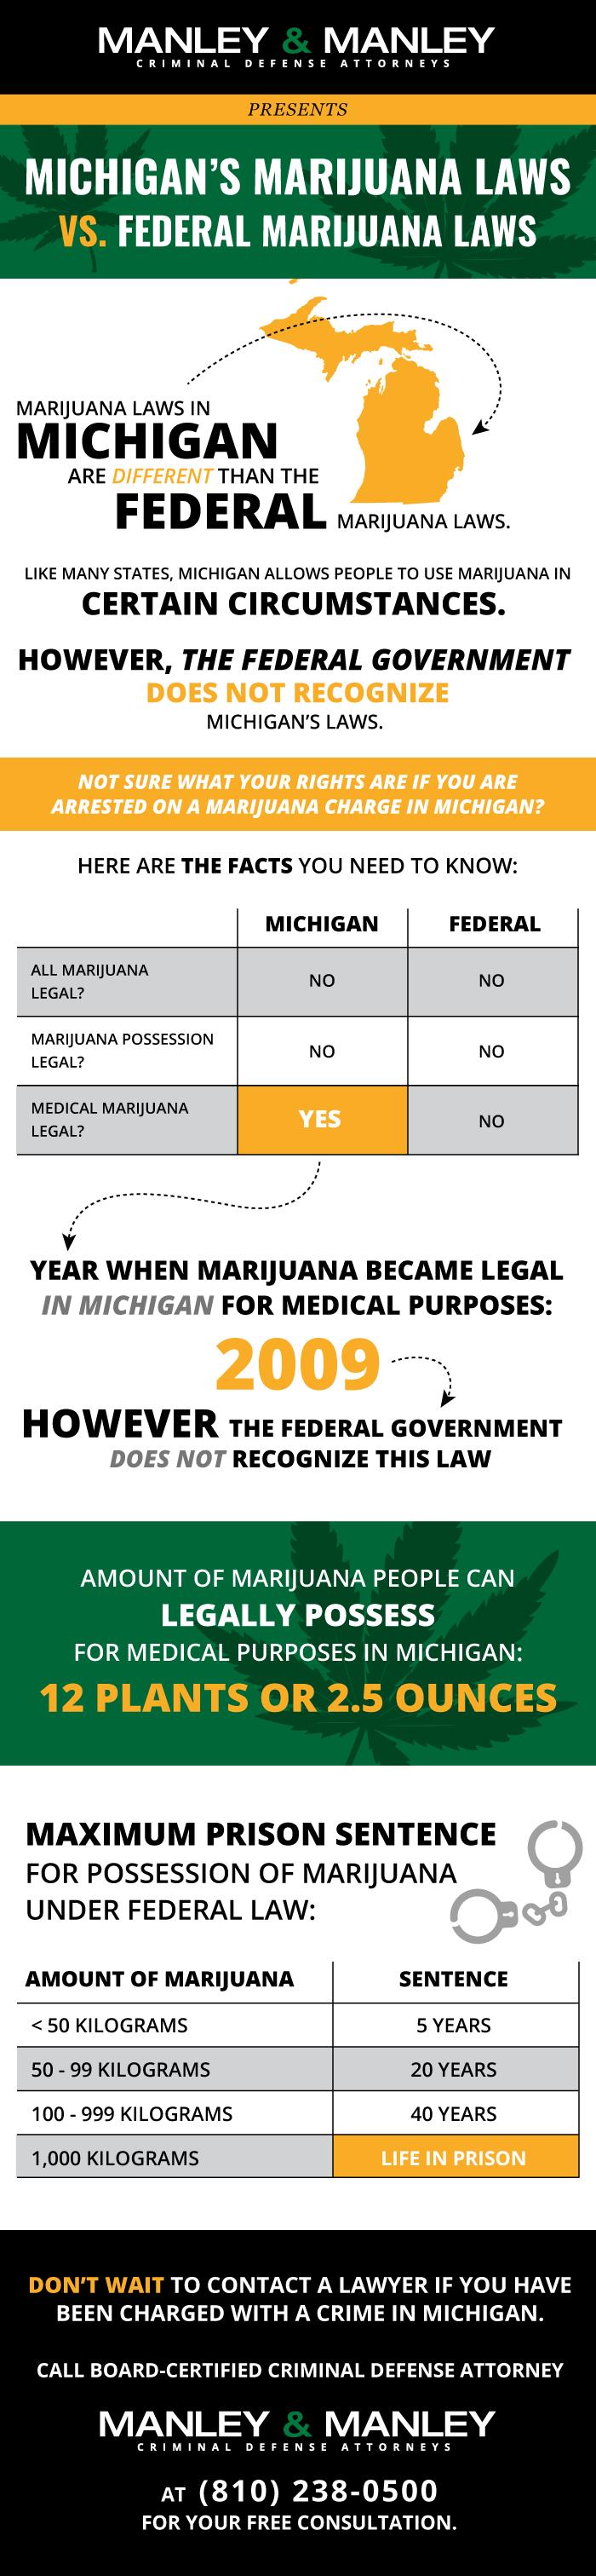 Marijuana Laws Infographic